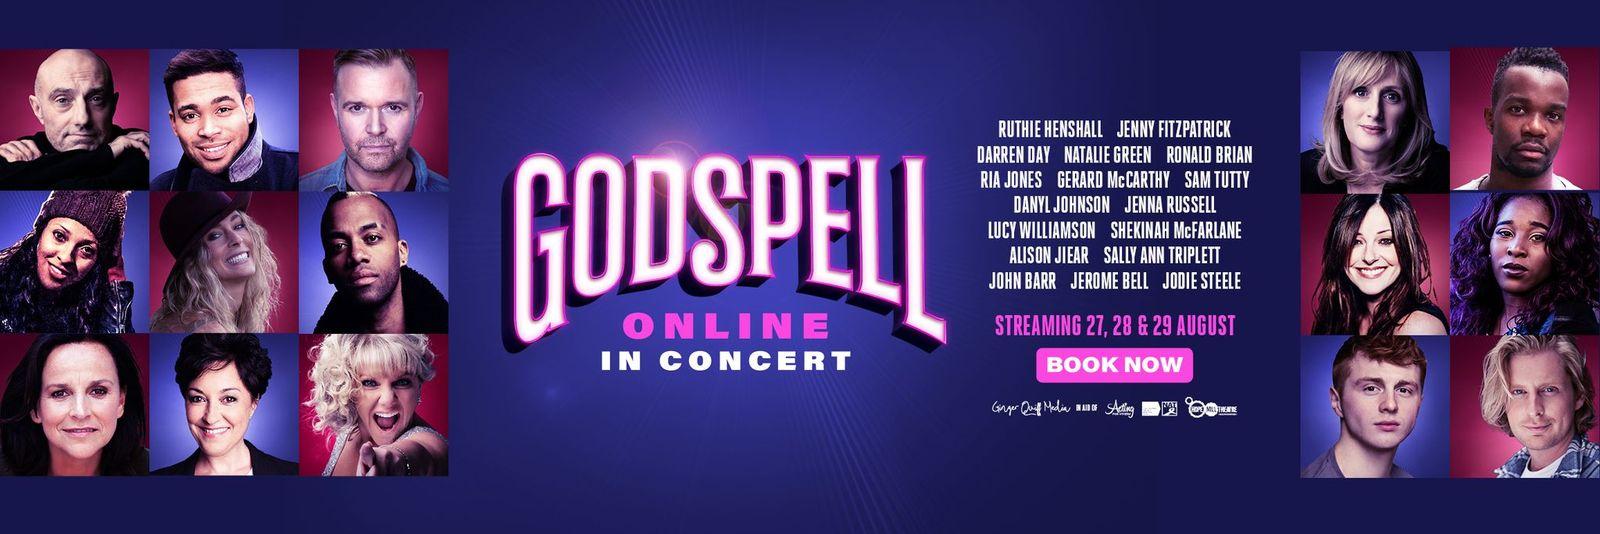 Godspell Online In Concert